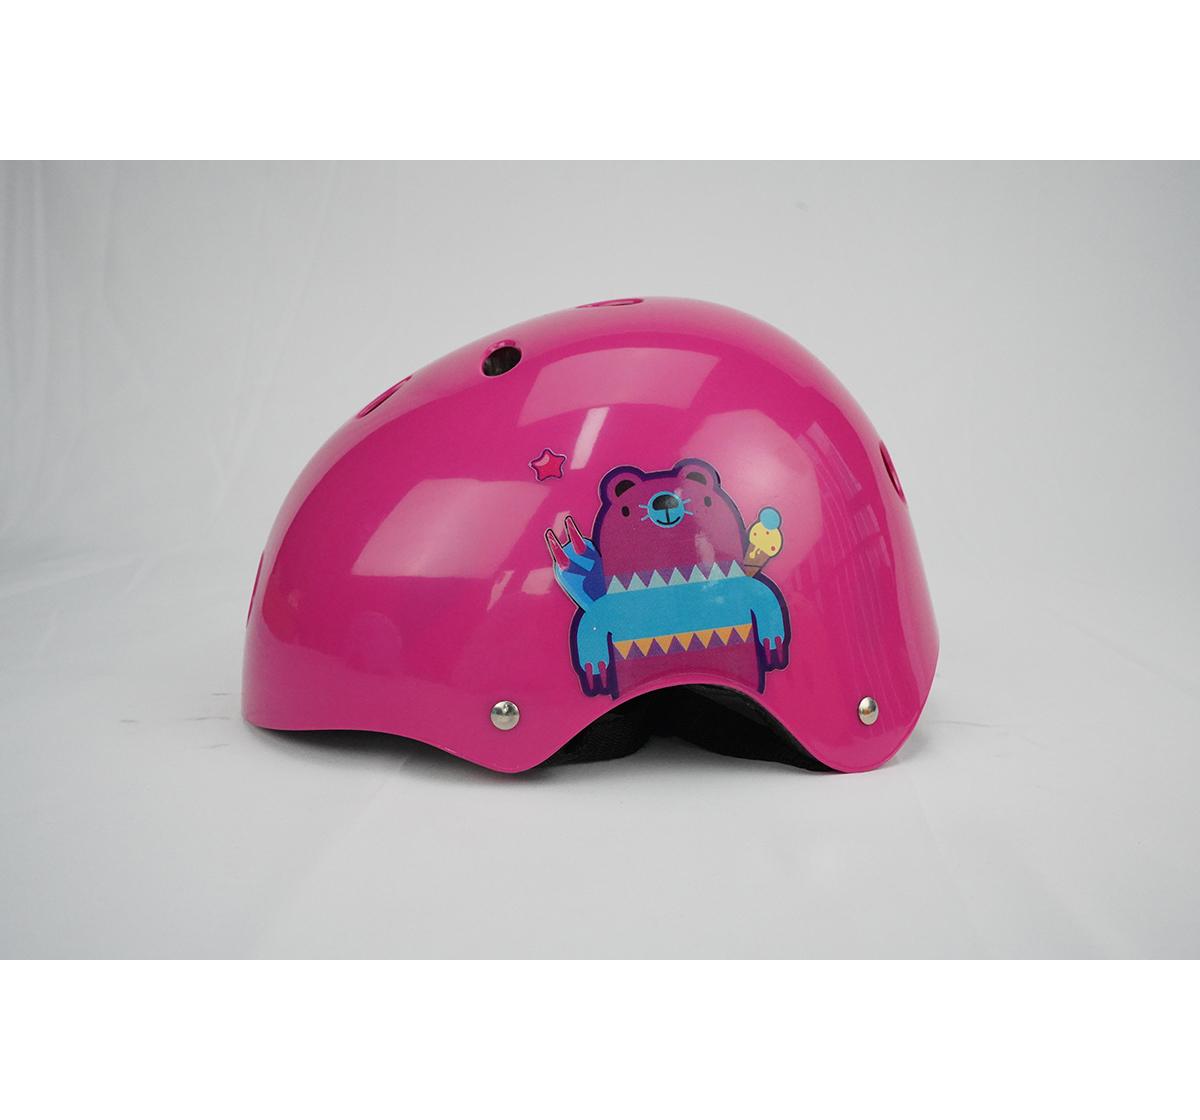 Zoozi   Zoozi Sports Helmet Bear, Sports & Accessories for Kids age 3Y+ (Purple)